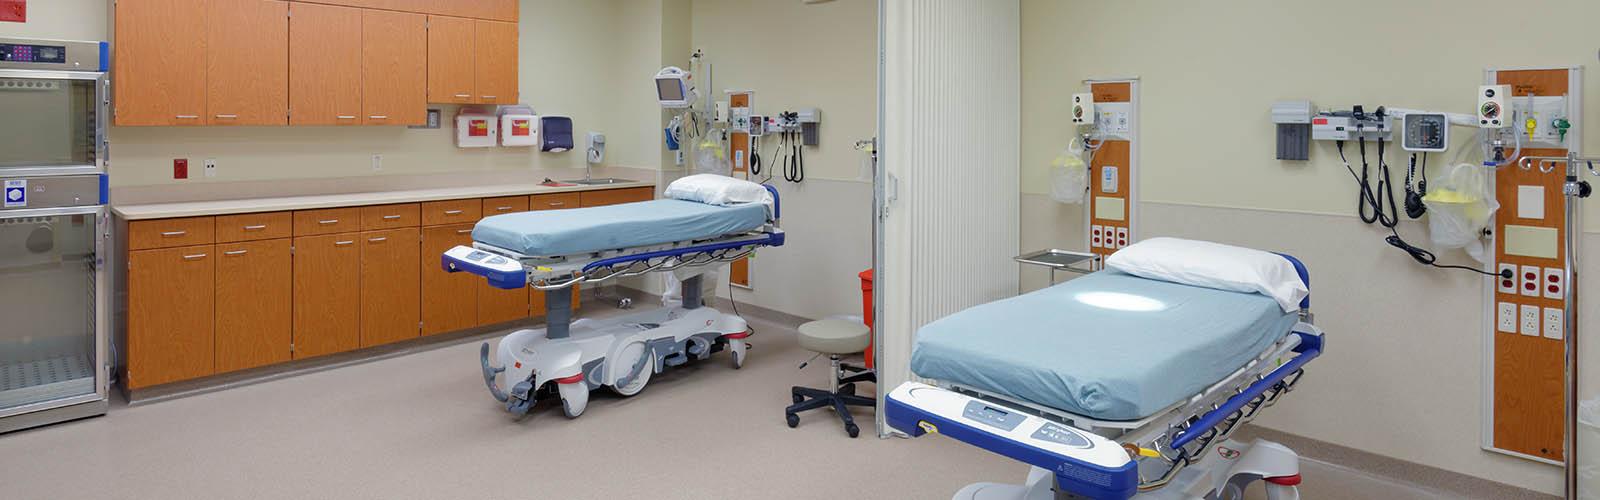 Texas County Memorial Hospital 3